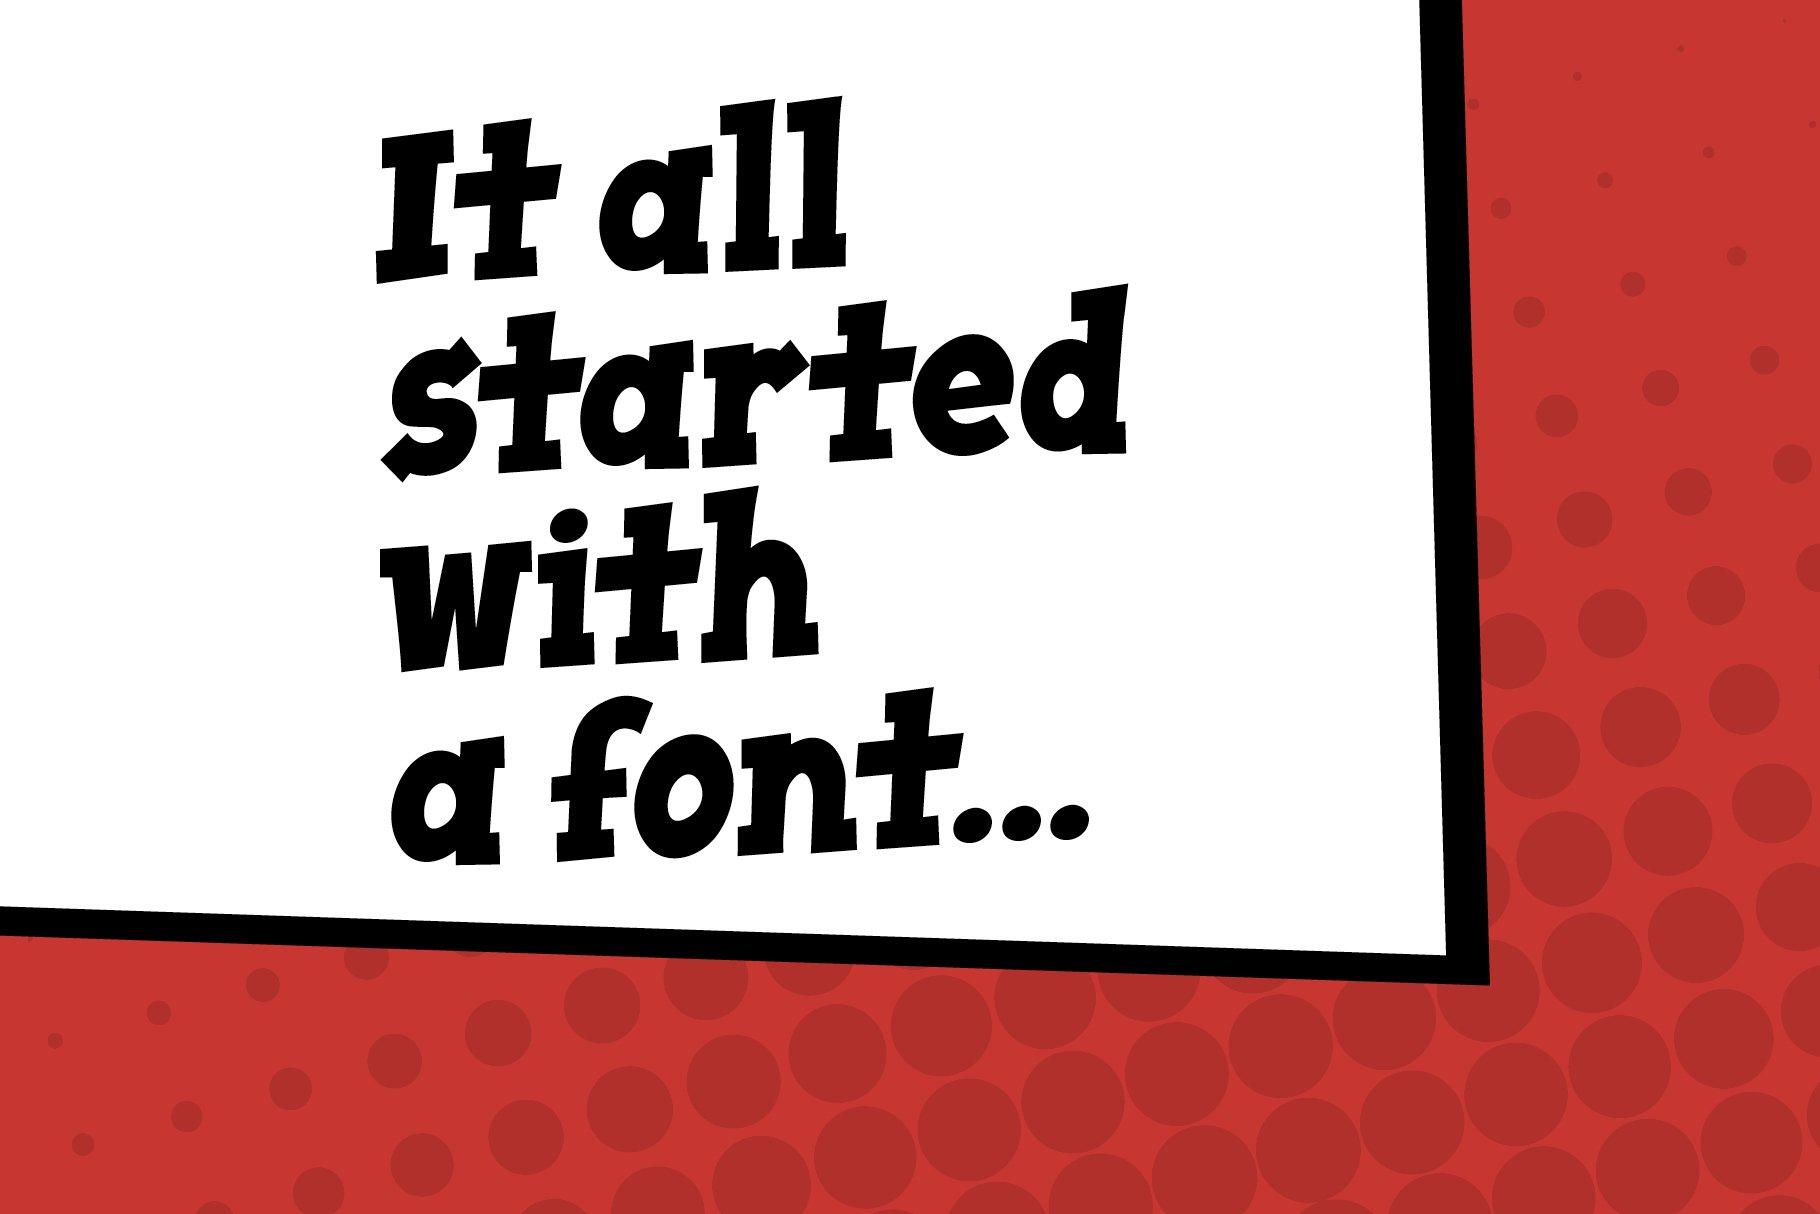 Wham! comic book cartoon font example image 6